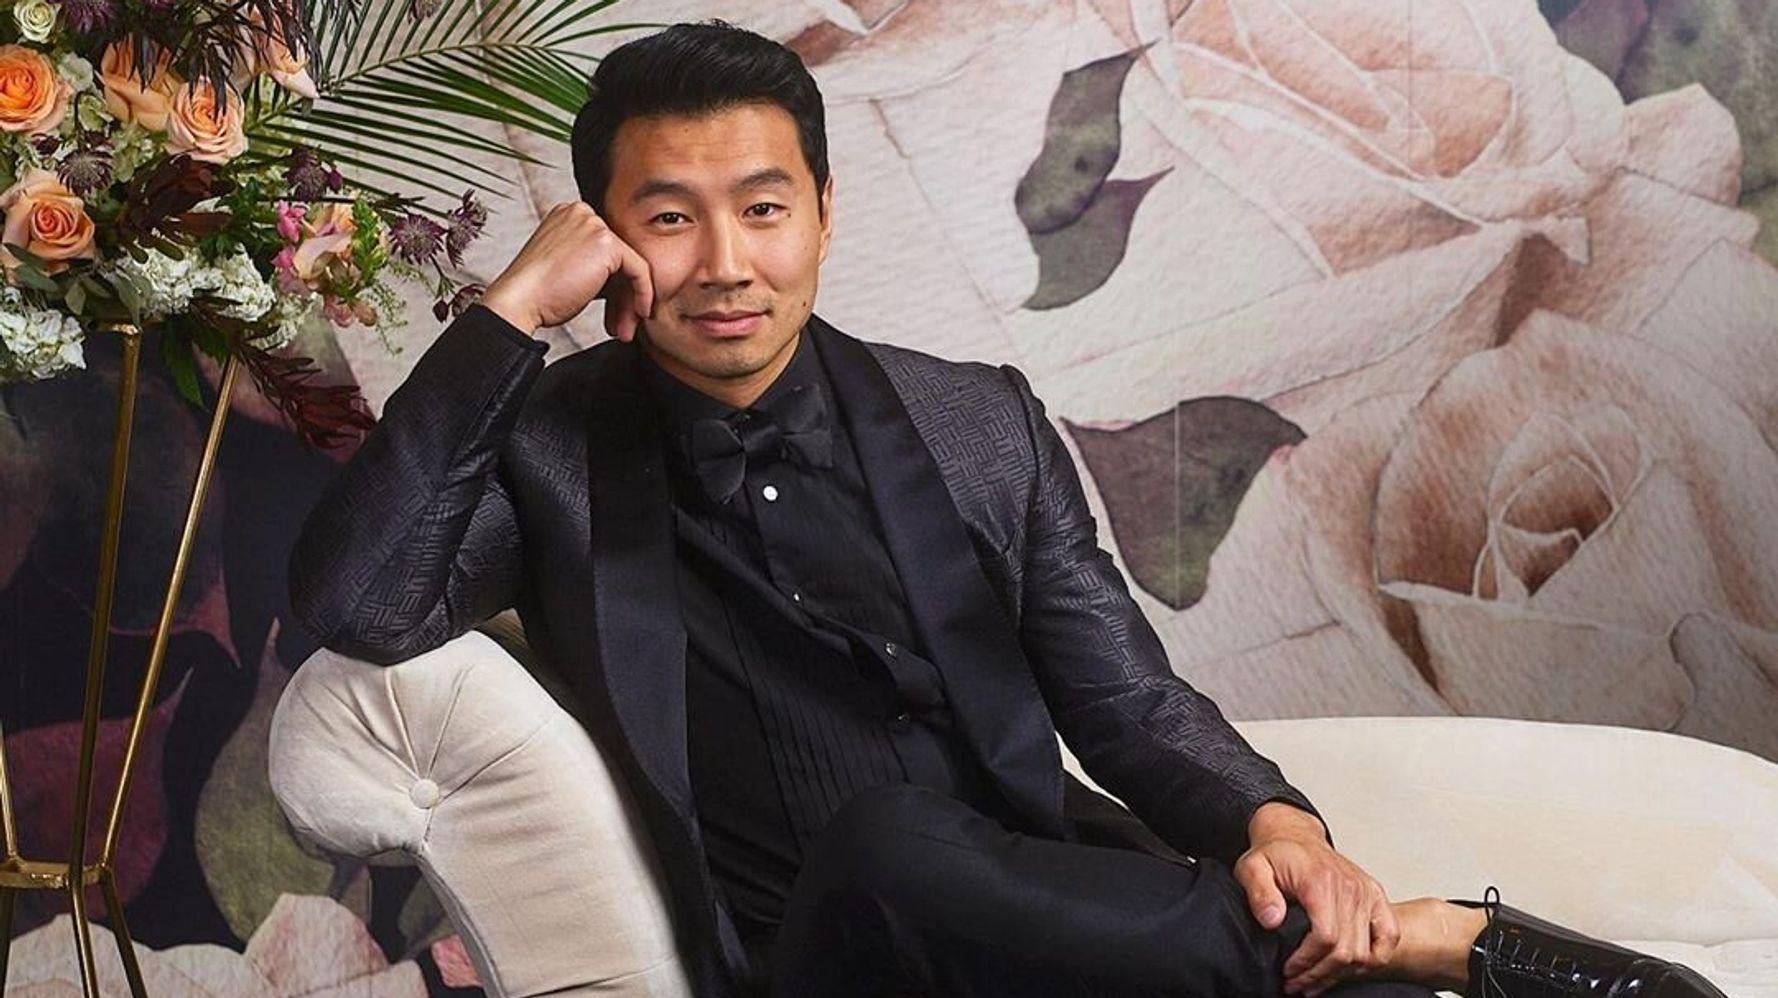 www.huffingtonpost.ca: Simu Liu Hits Back At Casting Notice Seeking Asian Actors With 'No Monolid'